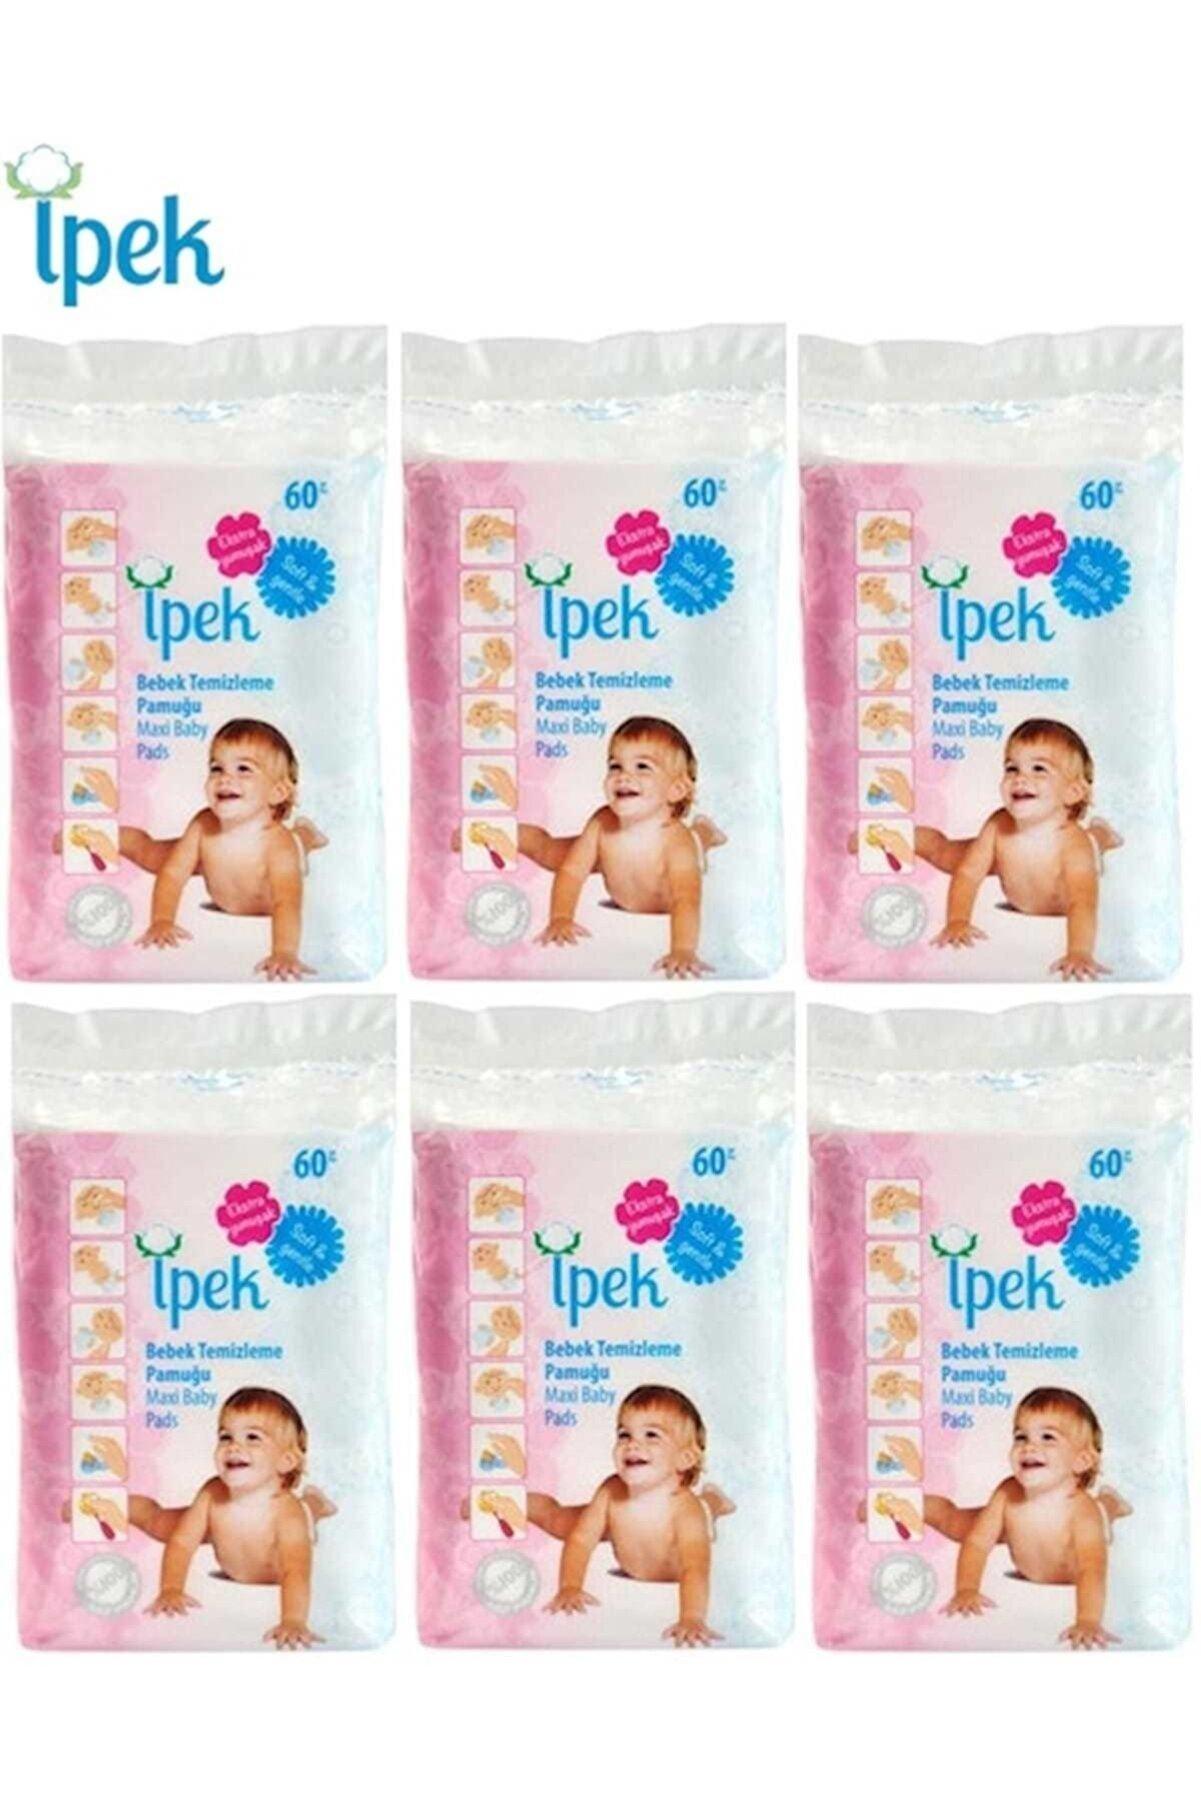 İpek Bebek Temizleme Pamuğu 360 Adet (6pk*60)